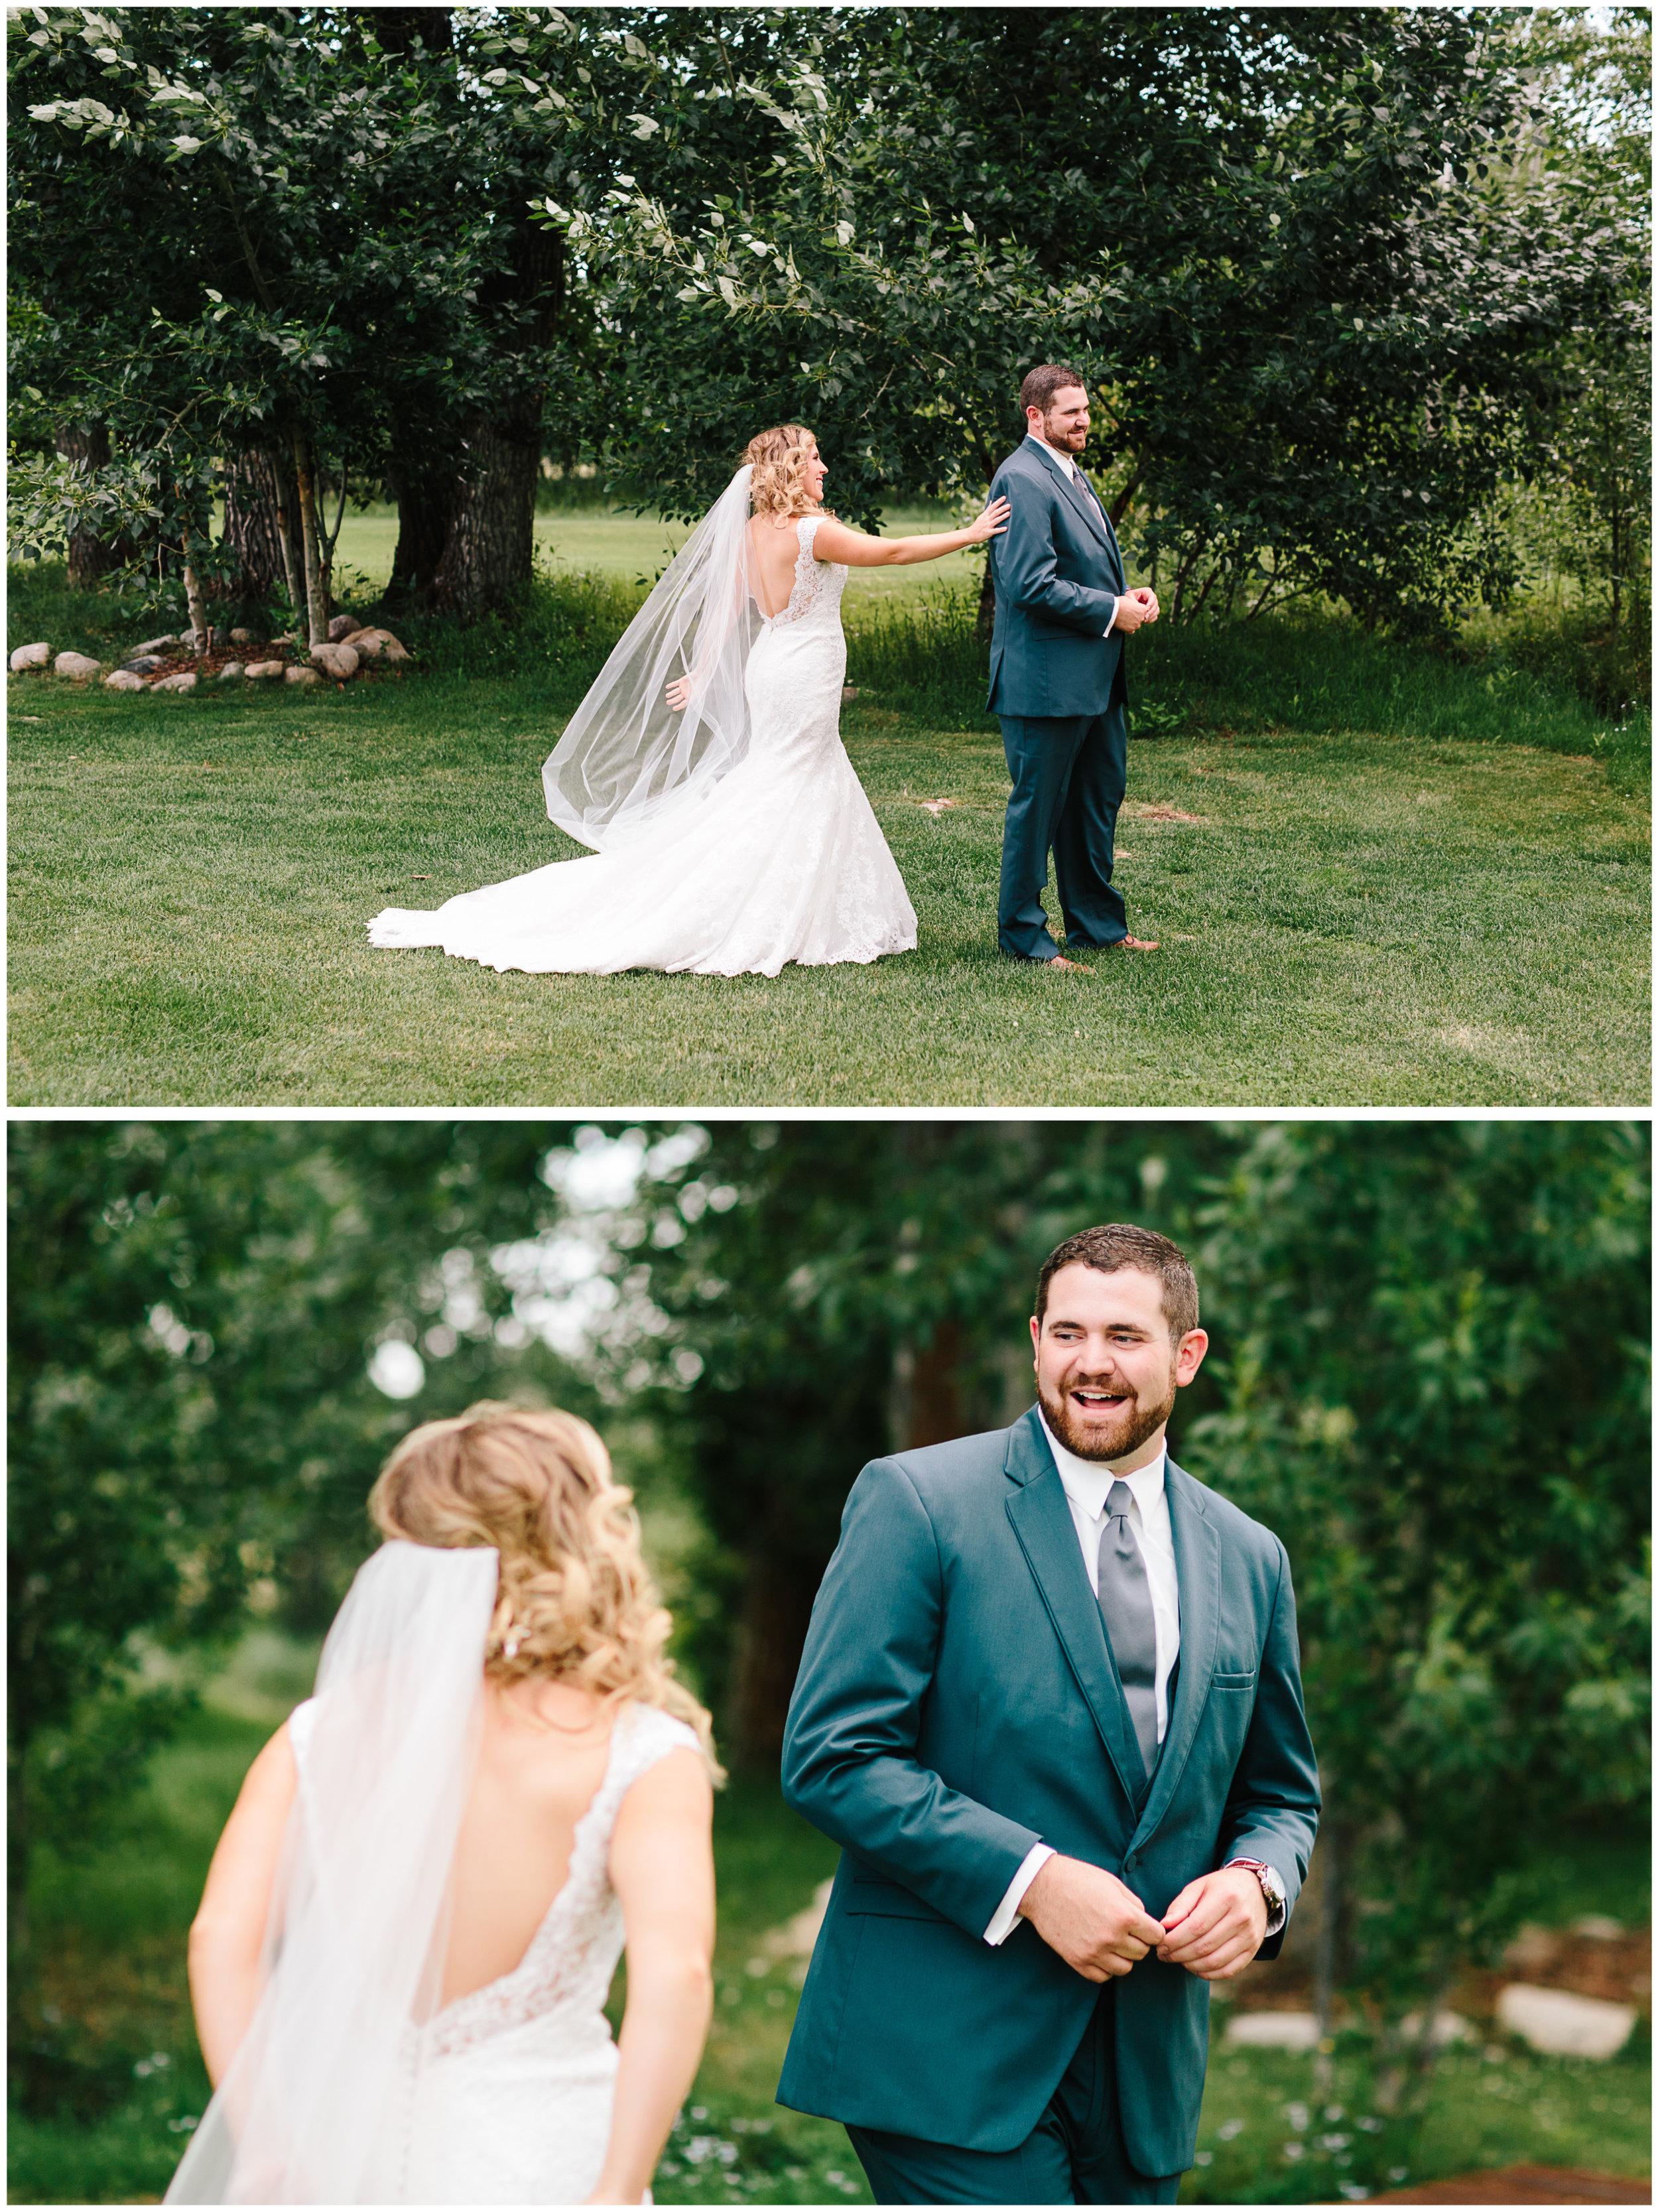 redlodge_montana_wedding_24.jpg